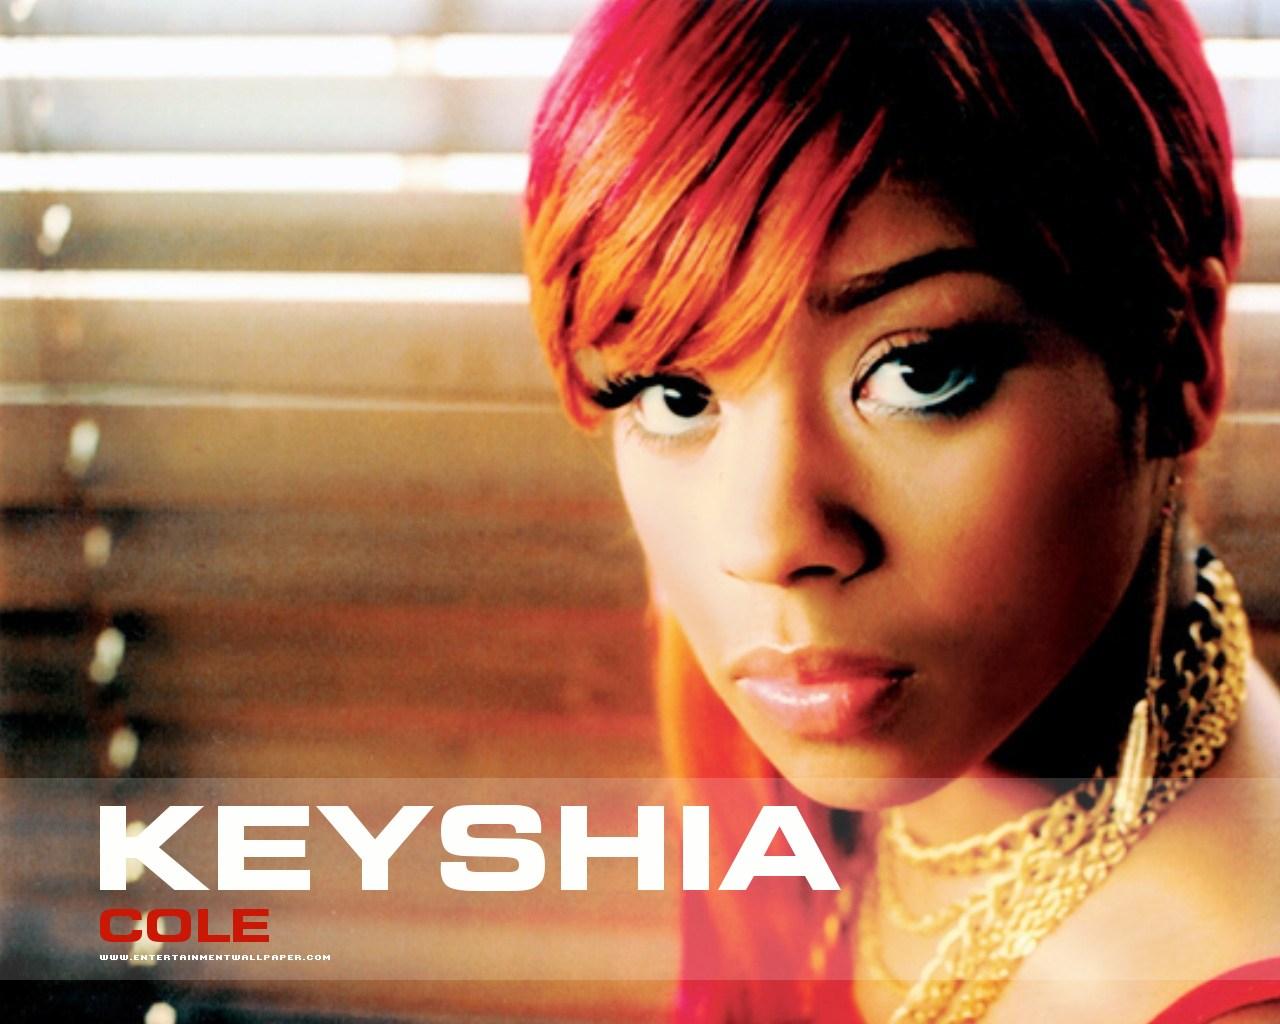 Keyshia Cole Hairstyle Trends: Keyshia Cole Hairstyle